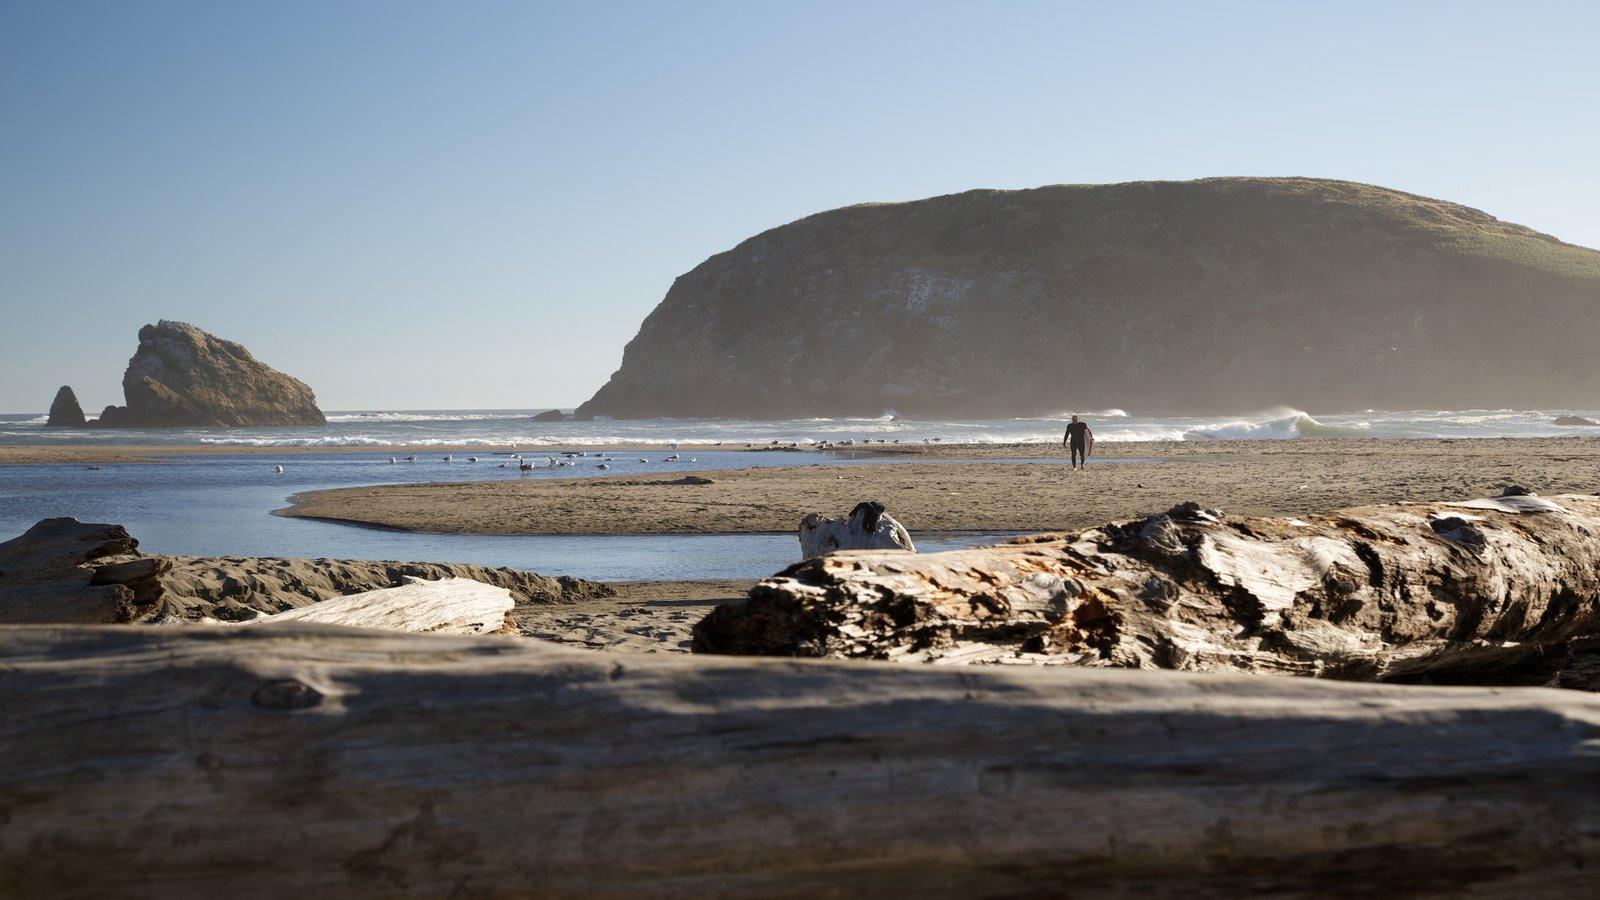 South Oregon Coast featuring general coastal views and a beach